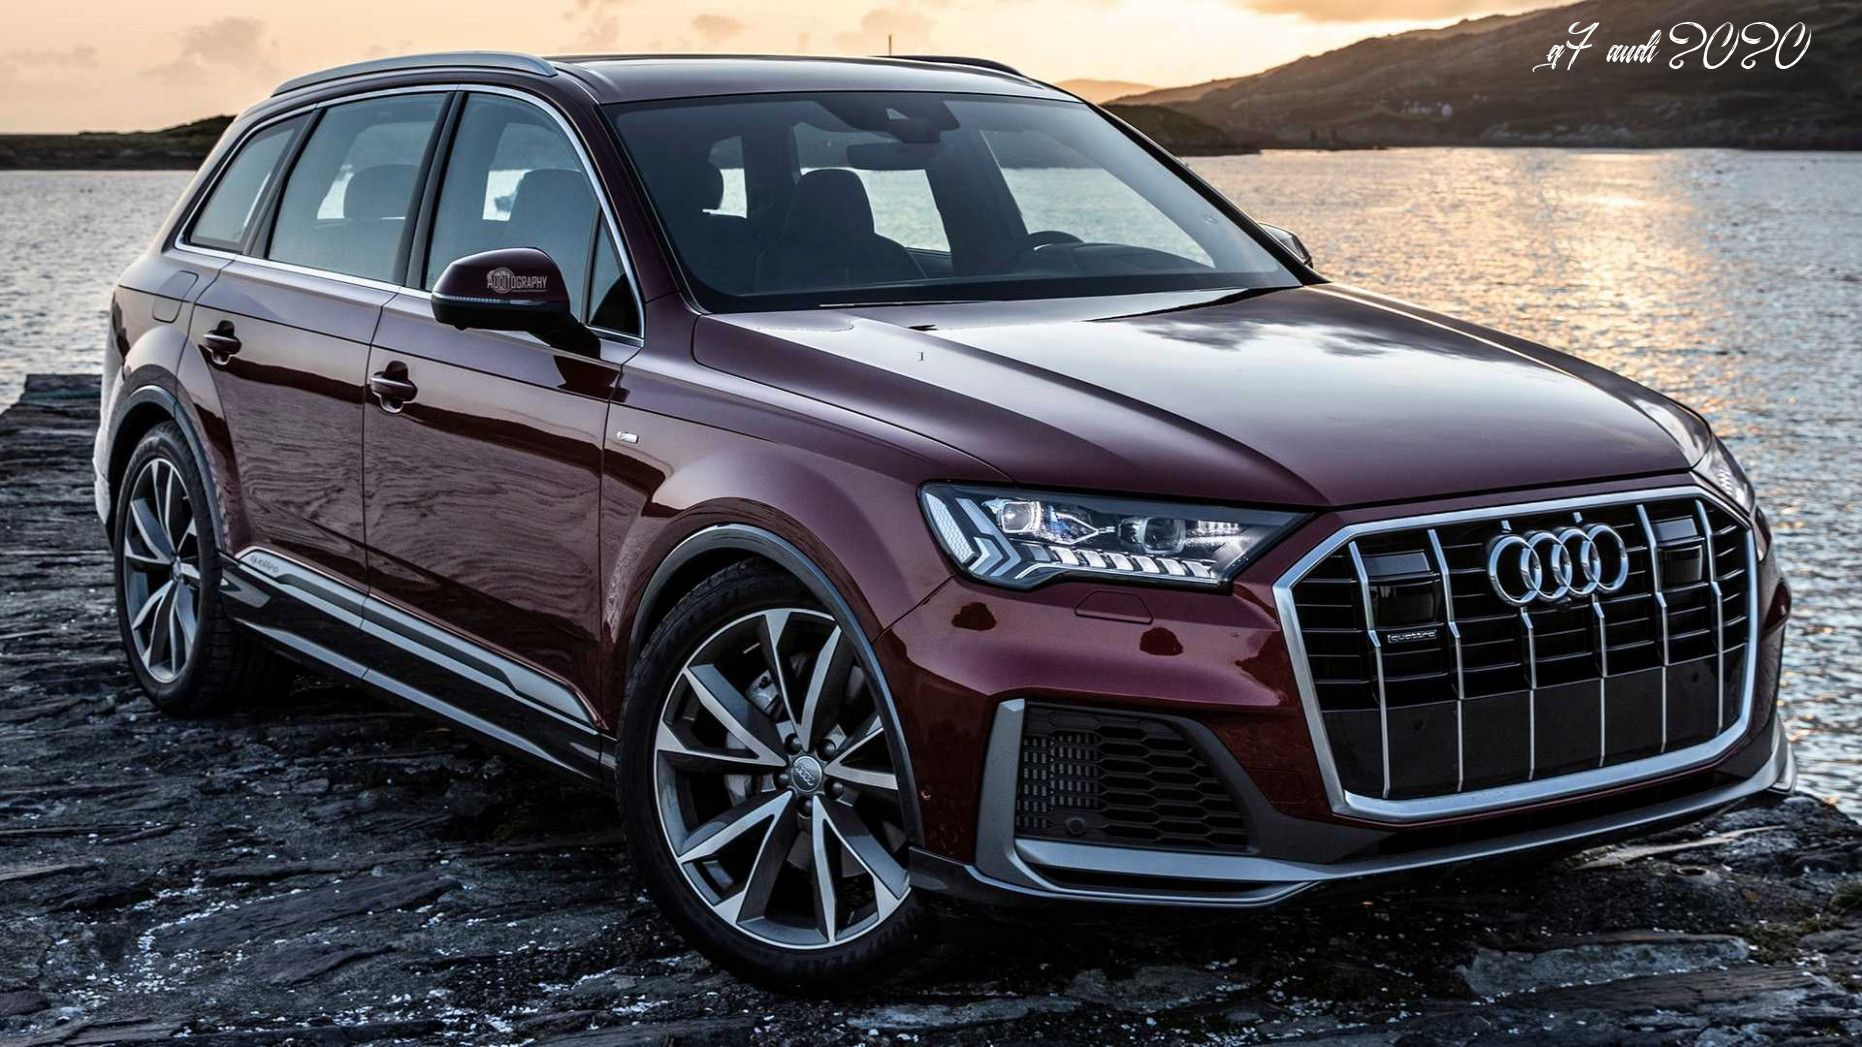 Q7 Audi 2020 Spy Shoot Audi Q7 Audi New Suv